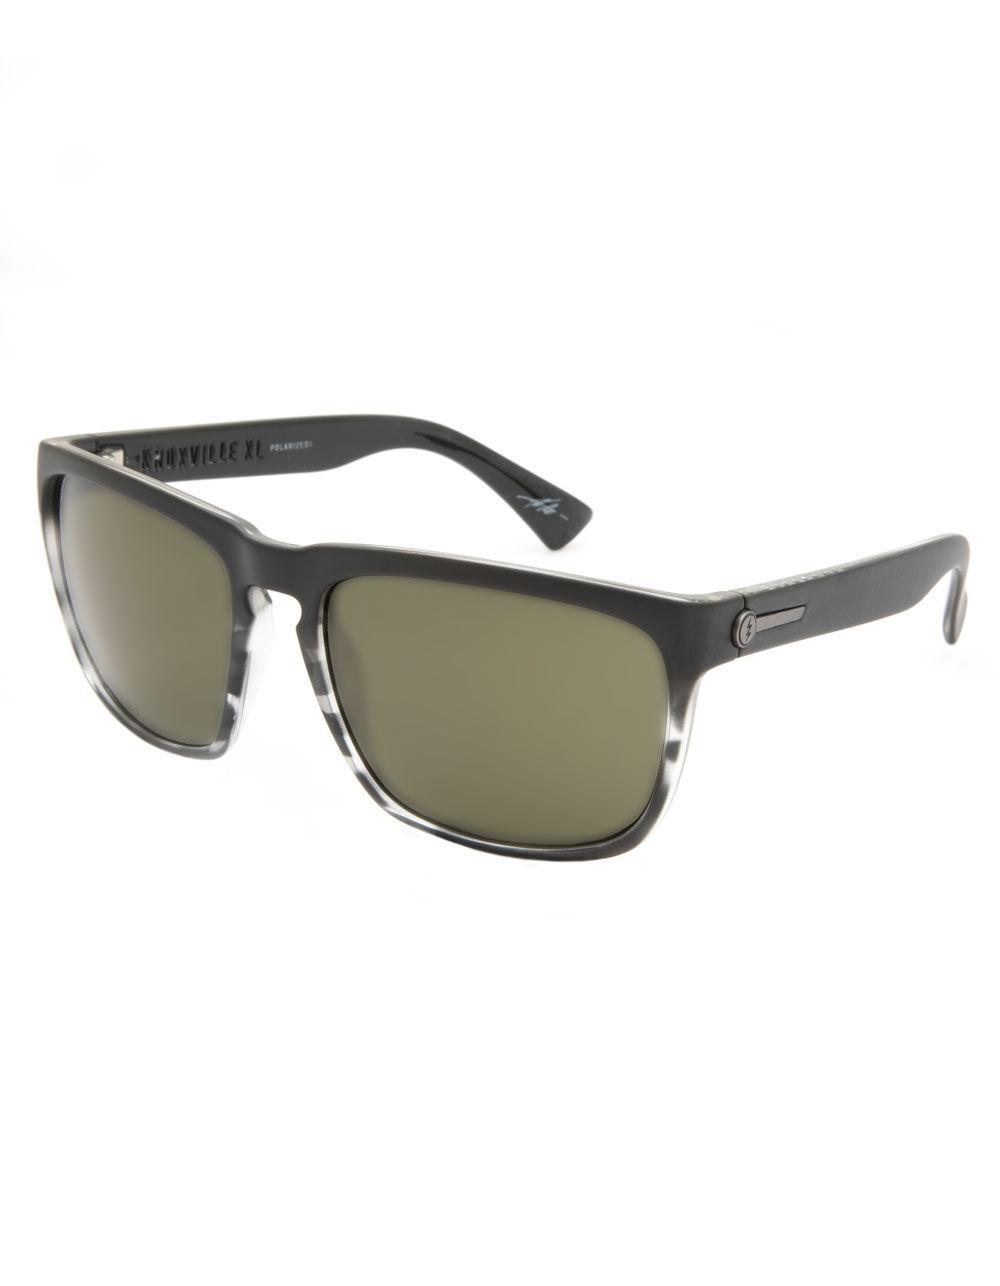 ELECTRIC Knoxville XL Darkstone Polarized Sunglasses